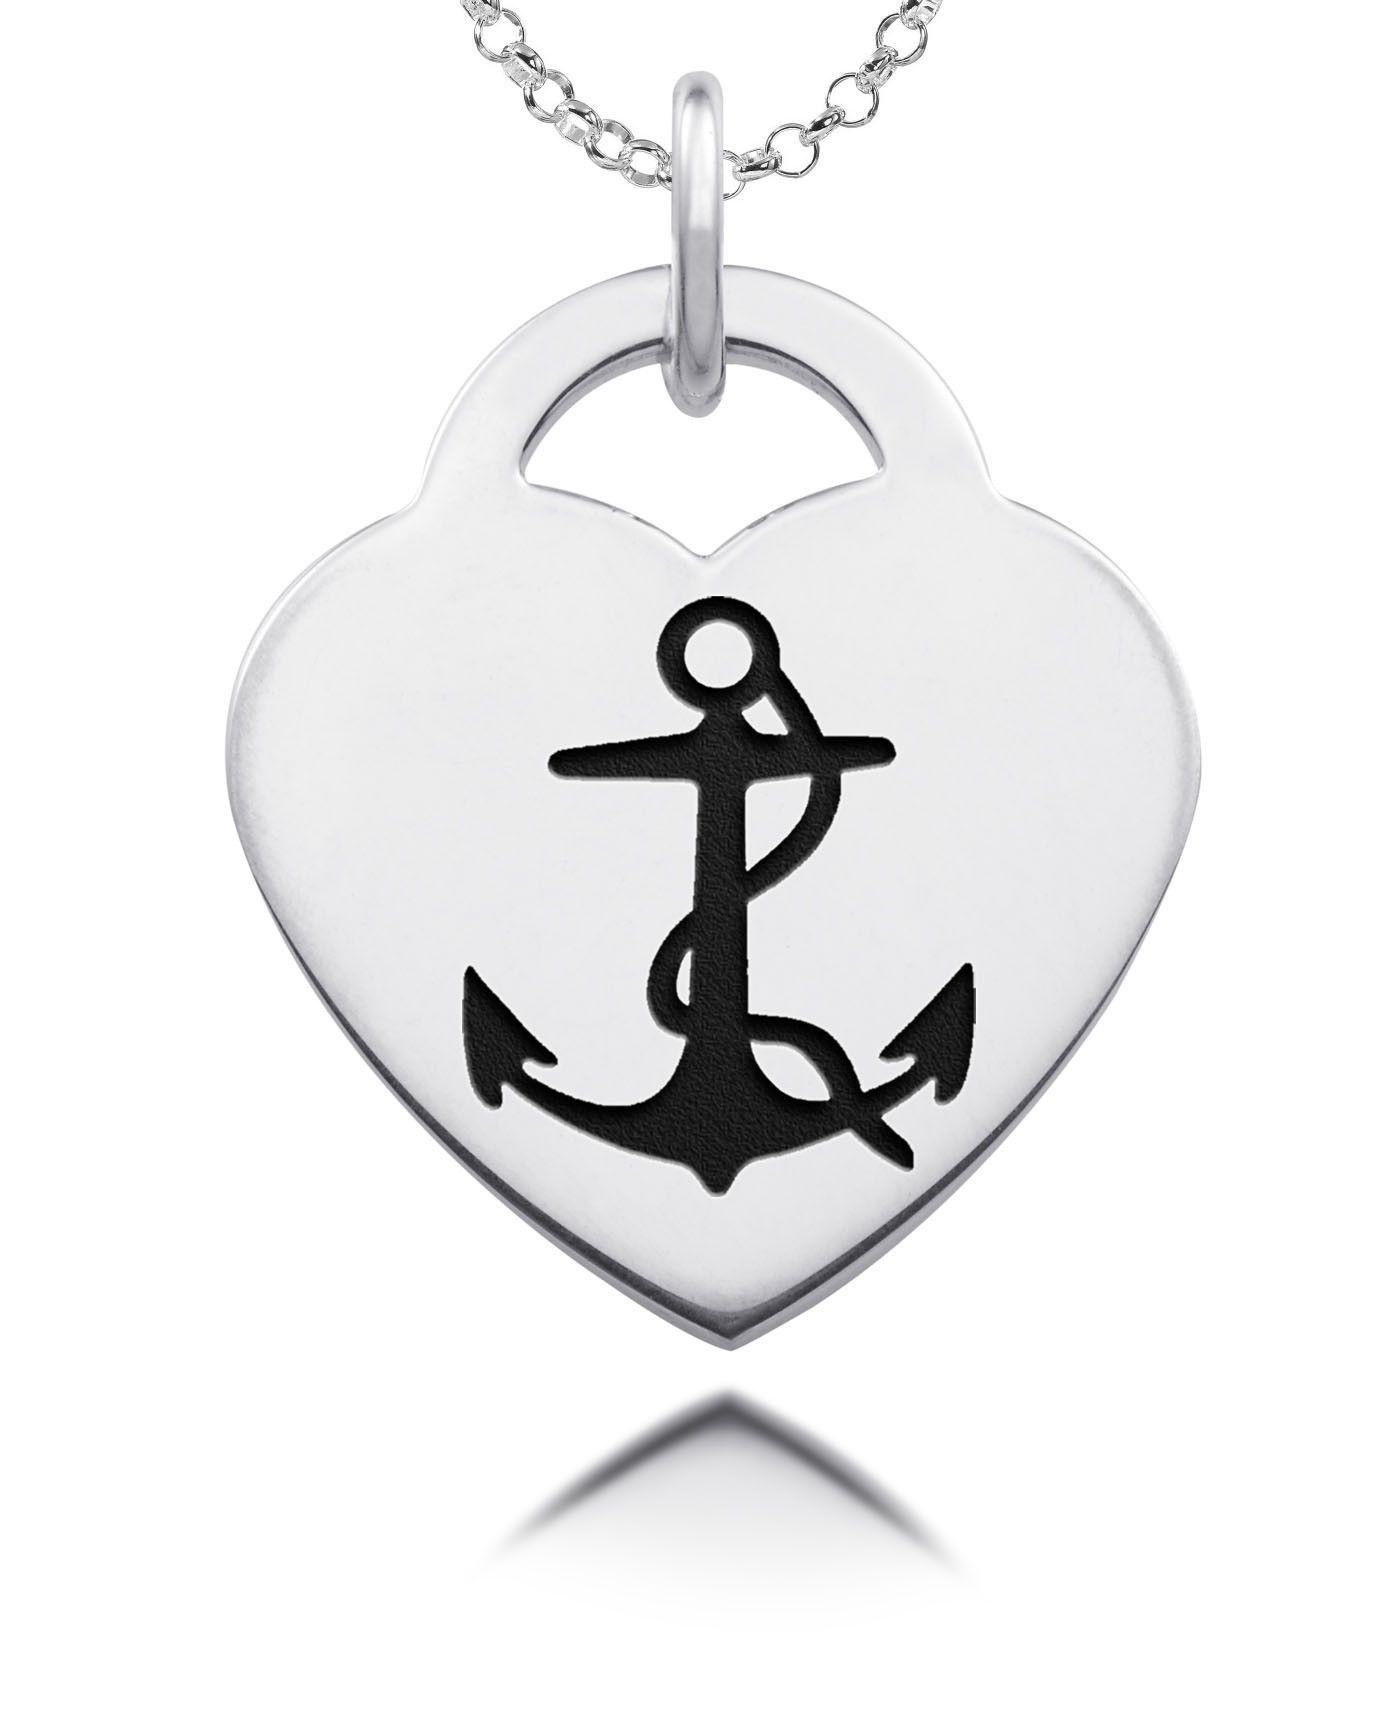 Delta gamma symbol heart charm gamma symbol heart charm and products delta gamma symbol heart charm buycottarizona Gallery